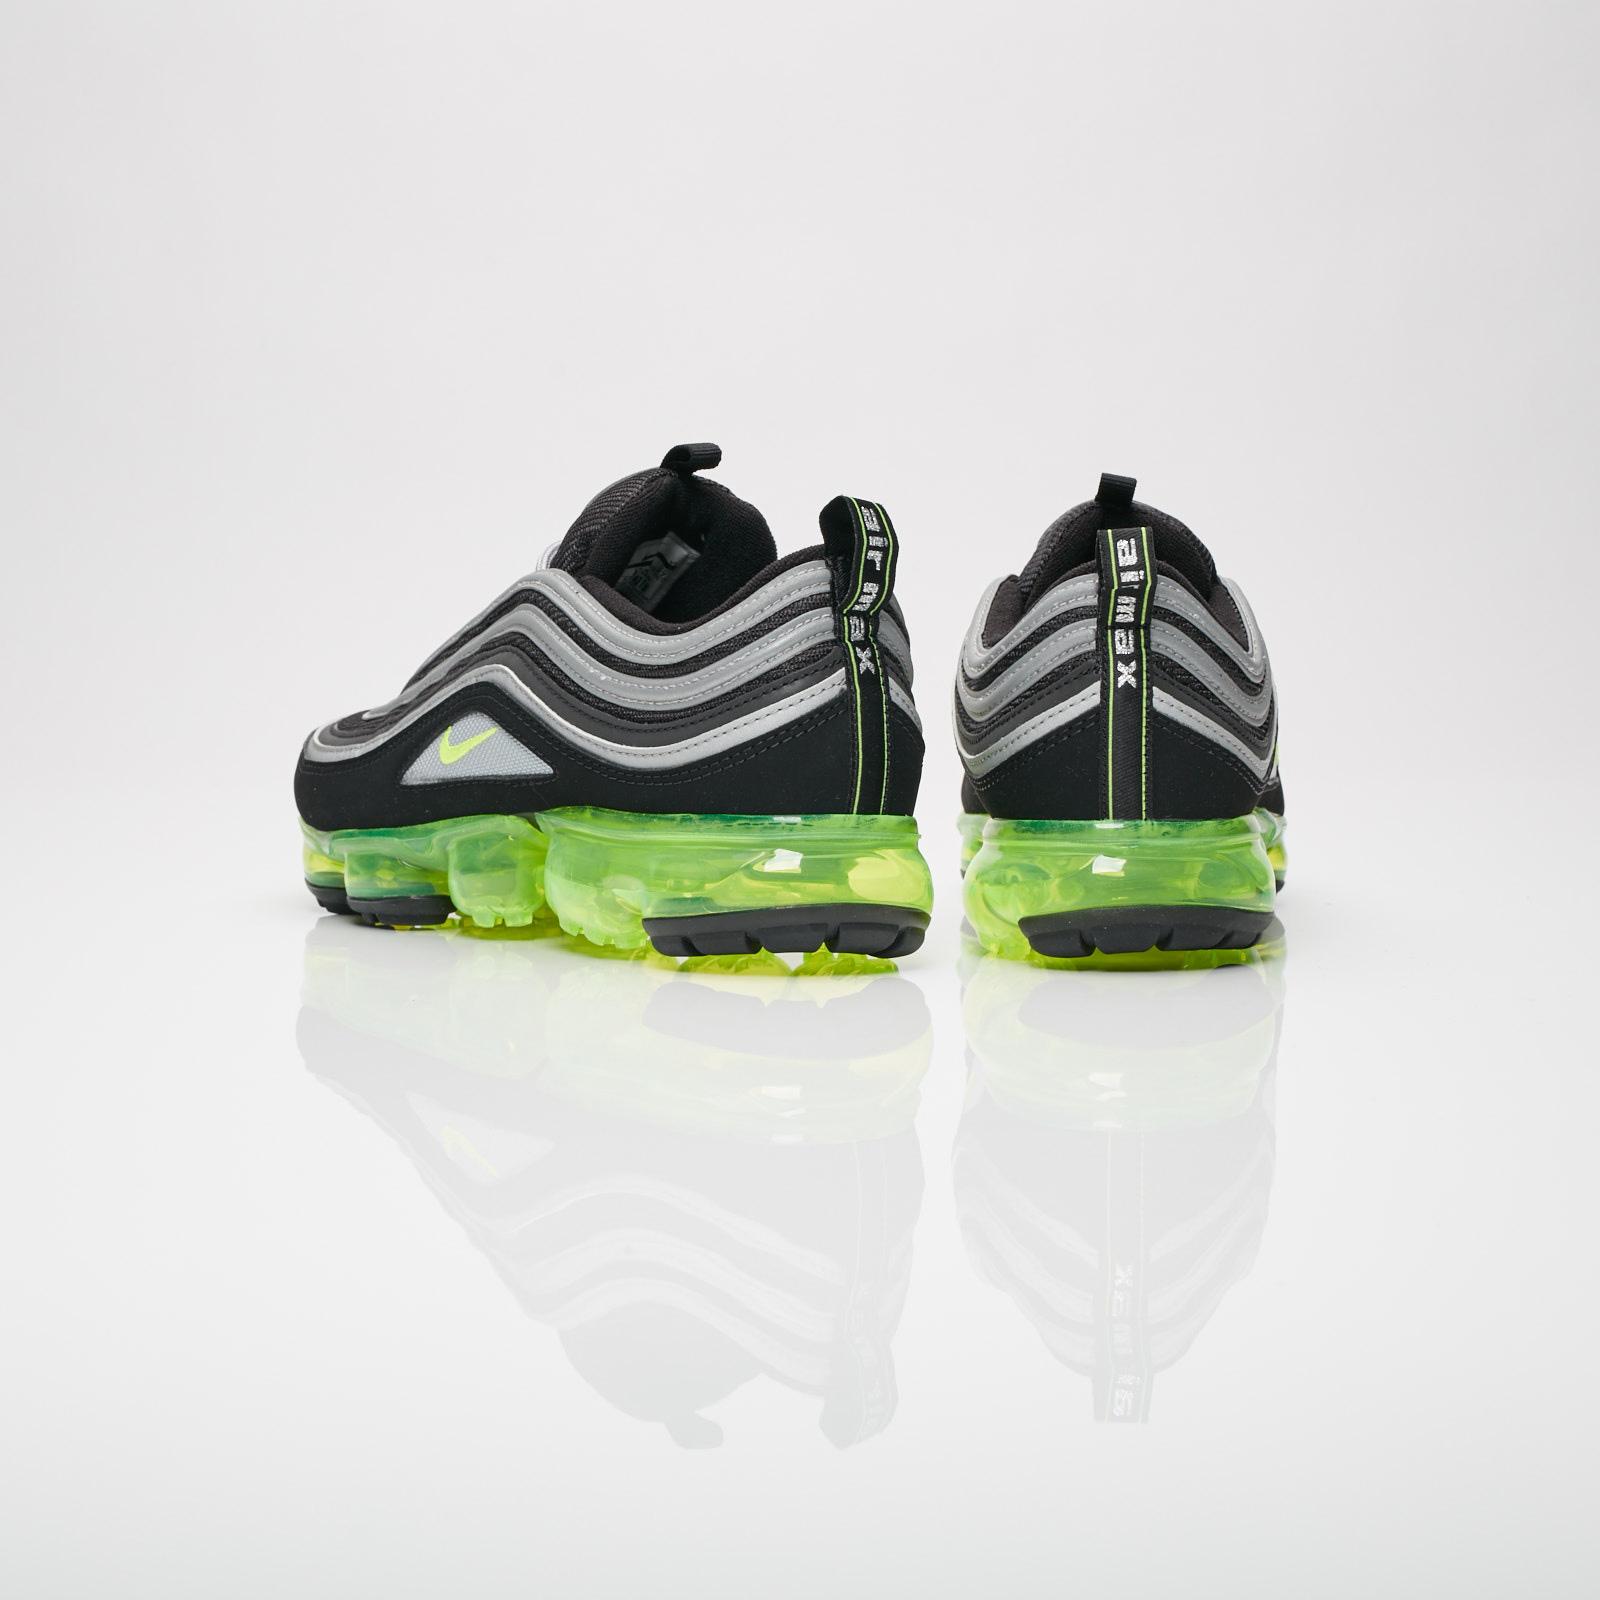 90306134934d7 Nike Air VaporMax 97 - Aj7291-001 - Sneakersnstuff